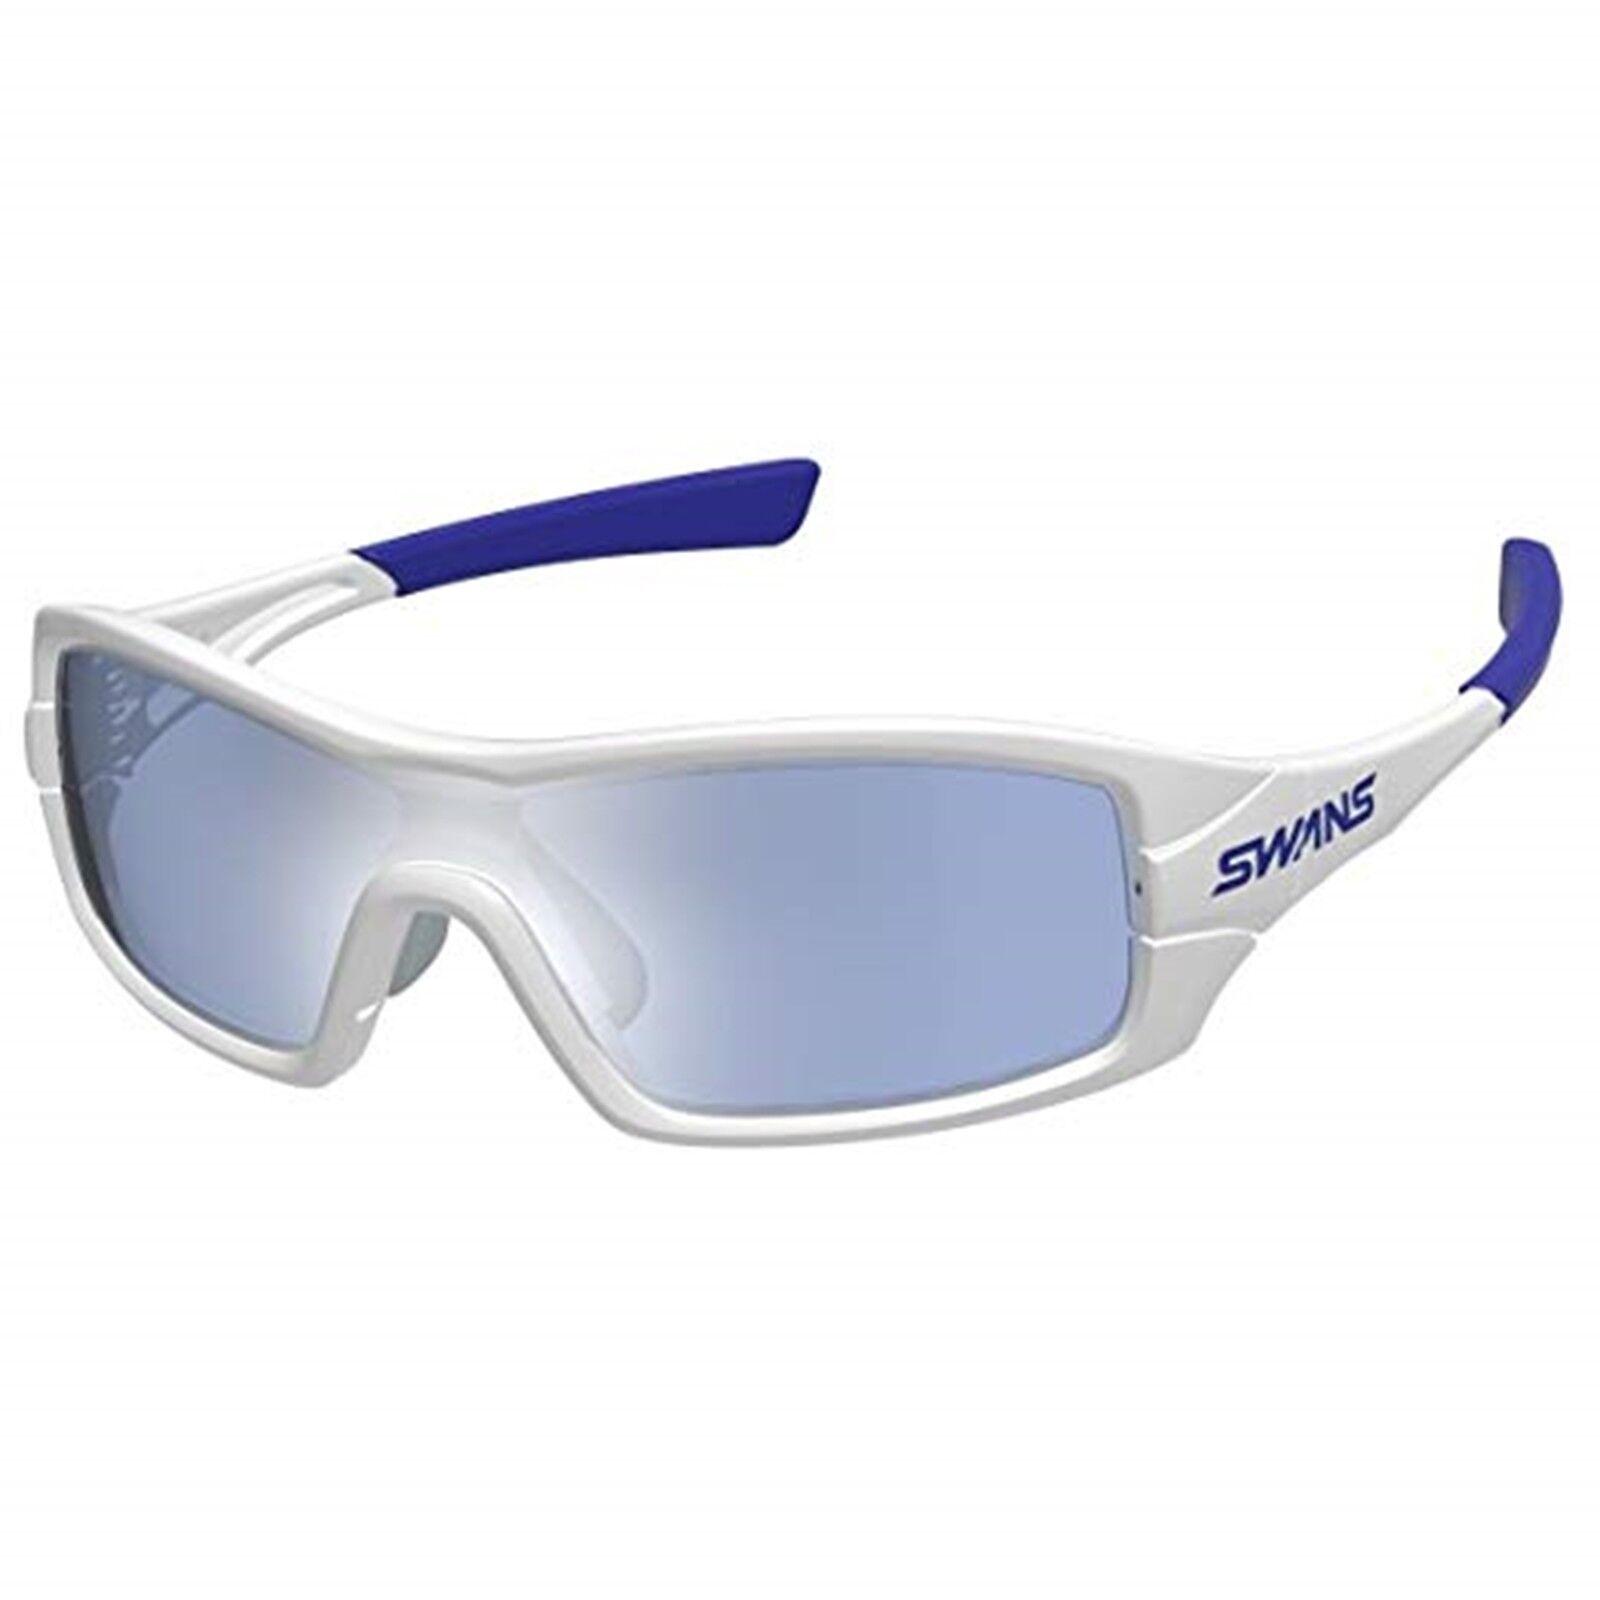 SWANS Sunglasses Japan two way Frame UV cut Ice Blau Mirror STRIX I-0714 PAW NEW